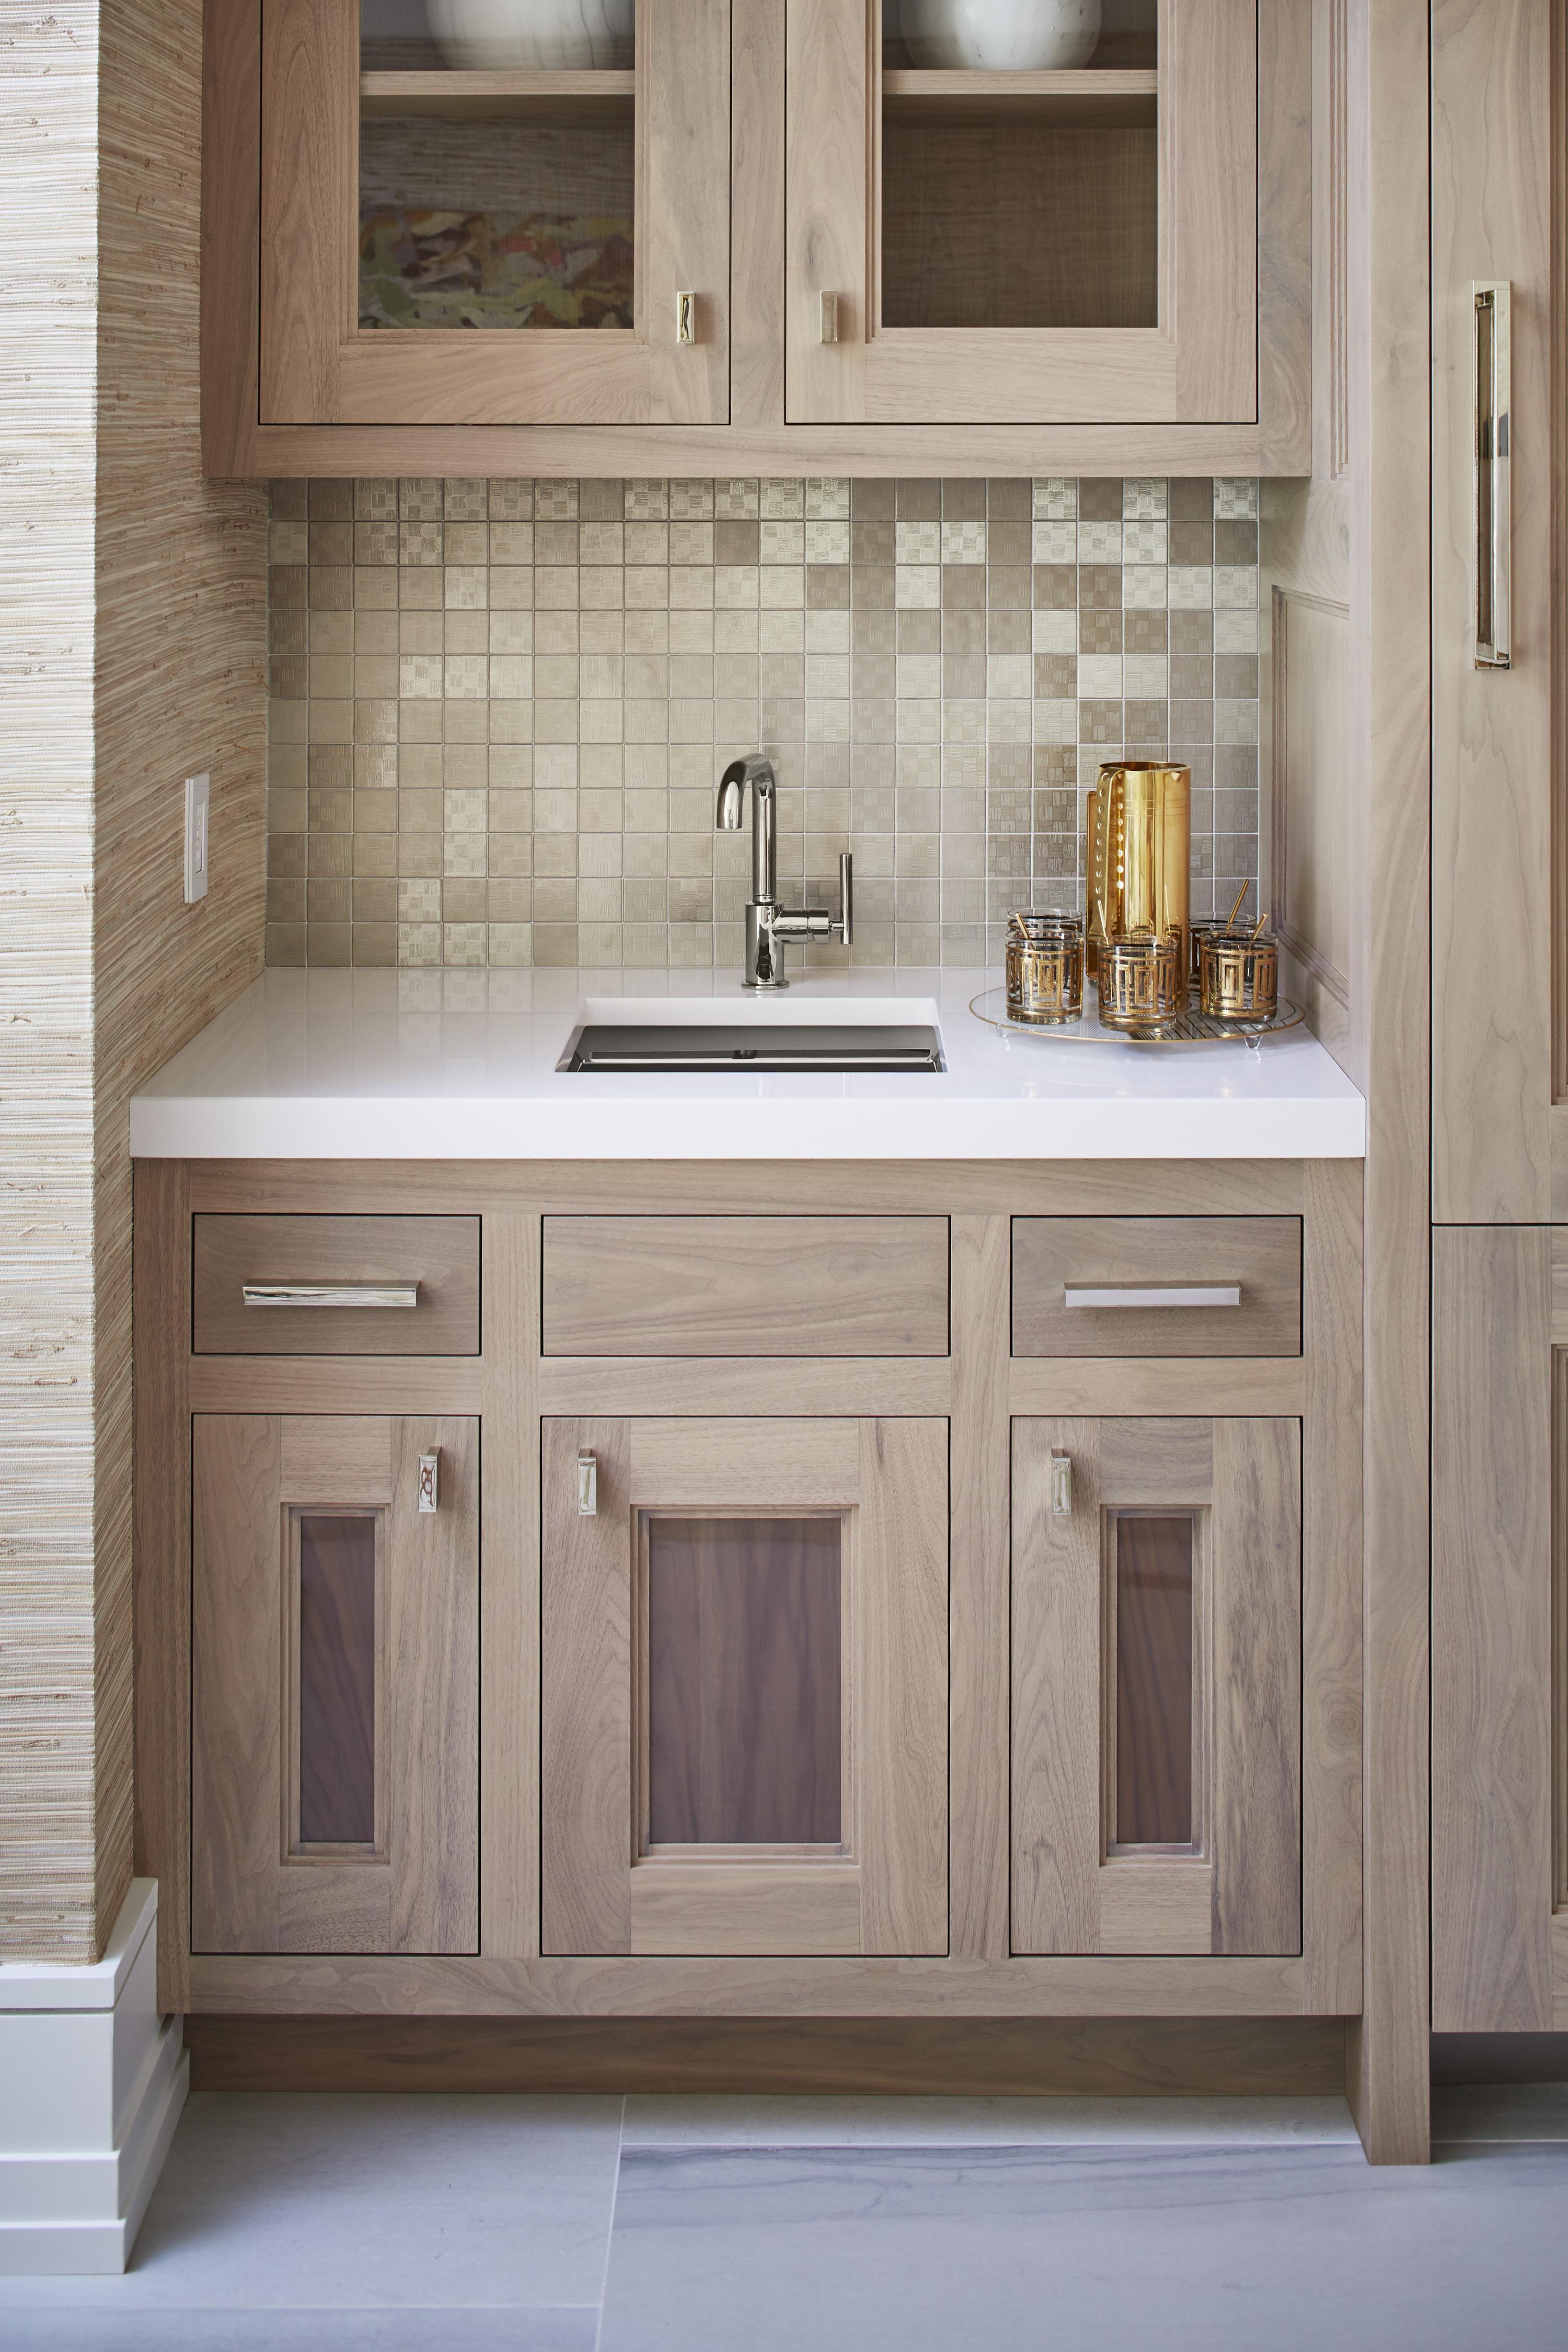 Purist Faucet     Poise Bar Sink     A design gem hidden in the rec room, the wet bar brings together custom wood cabinetry with a shimmering metallic backsplash.